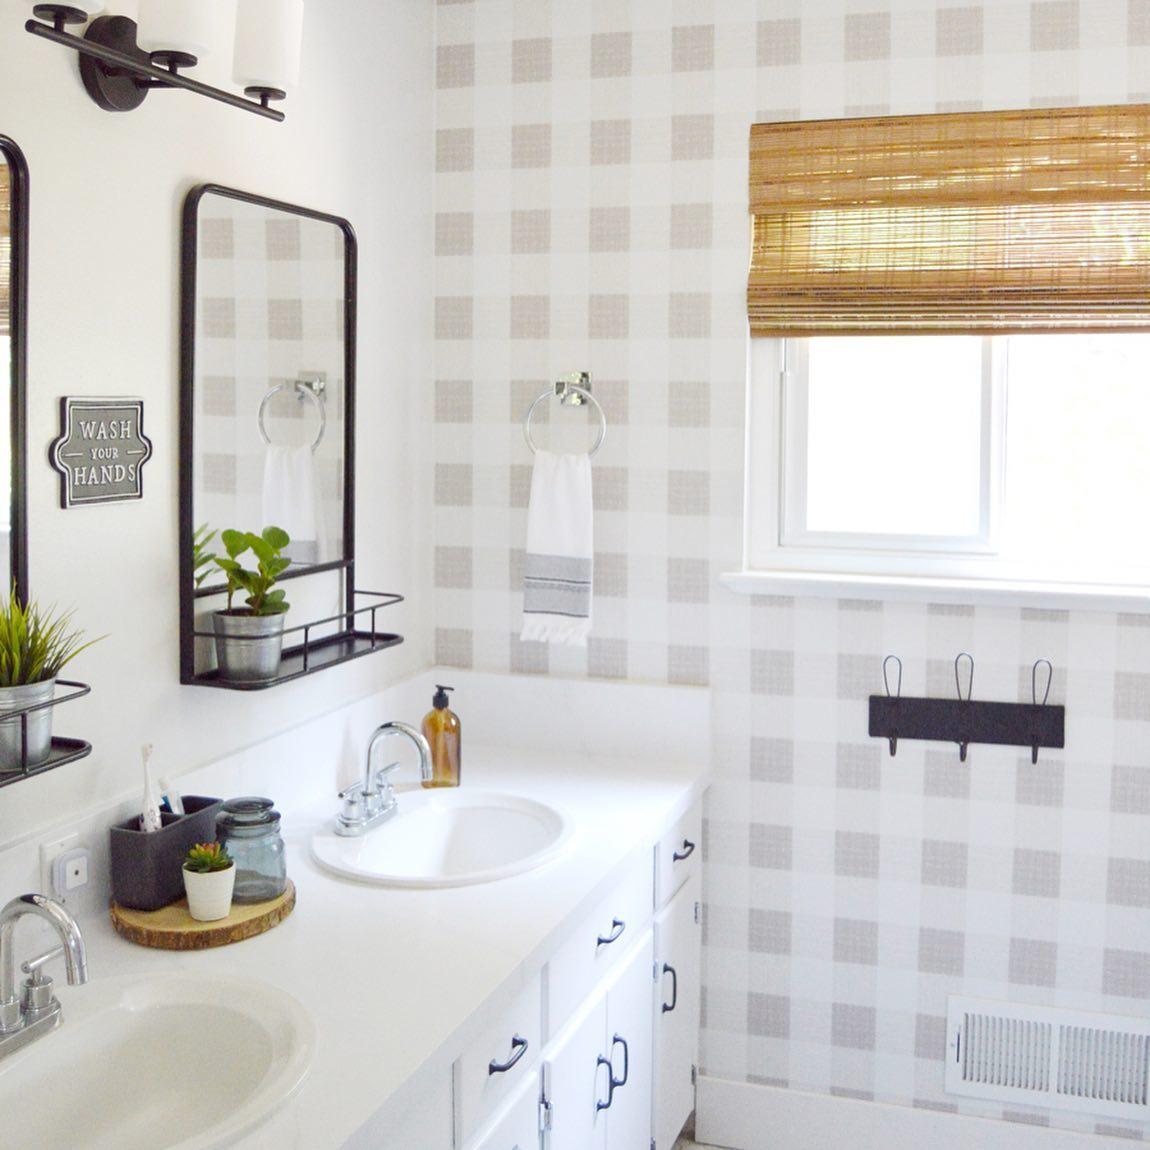 Refreshed modern bathroom Instagram Post